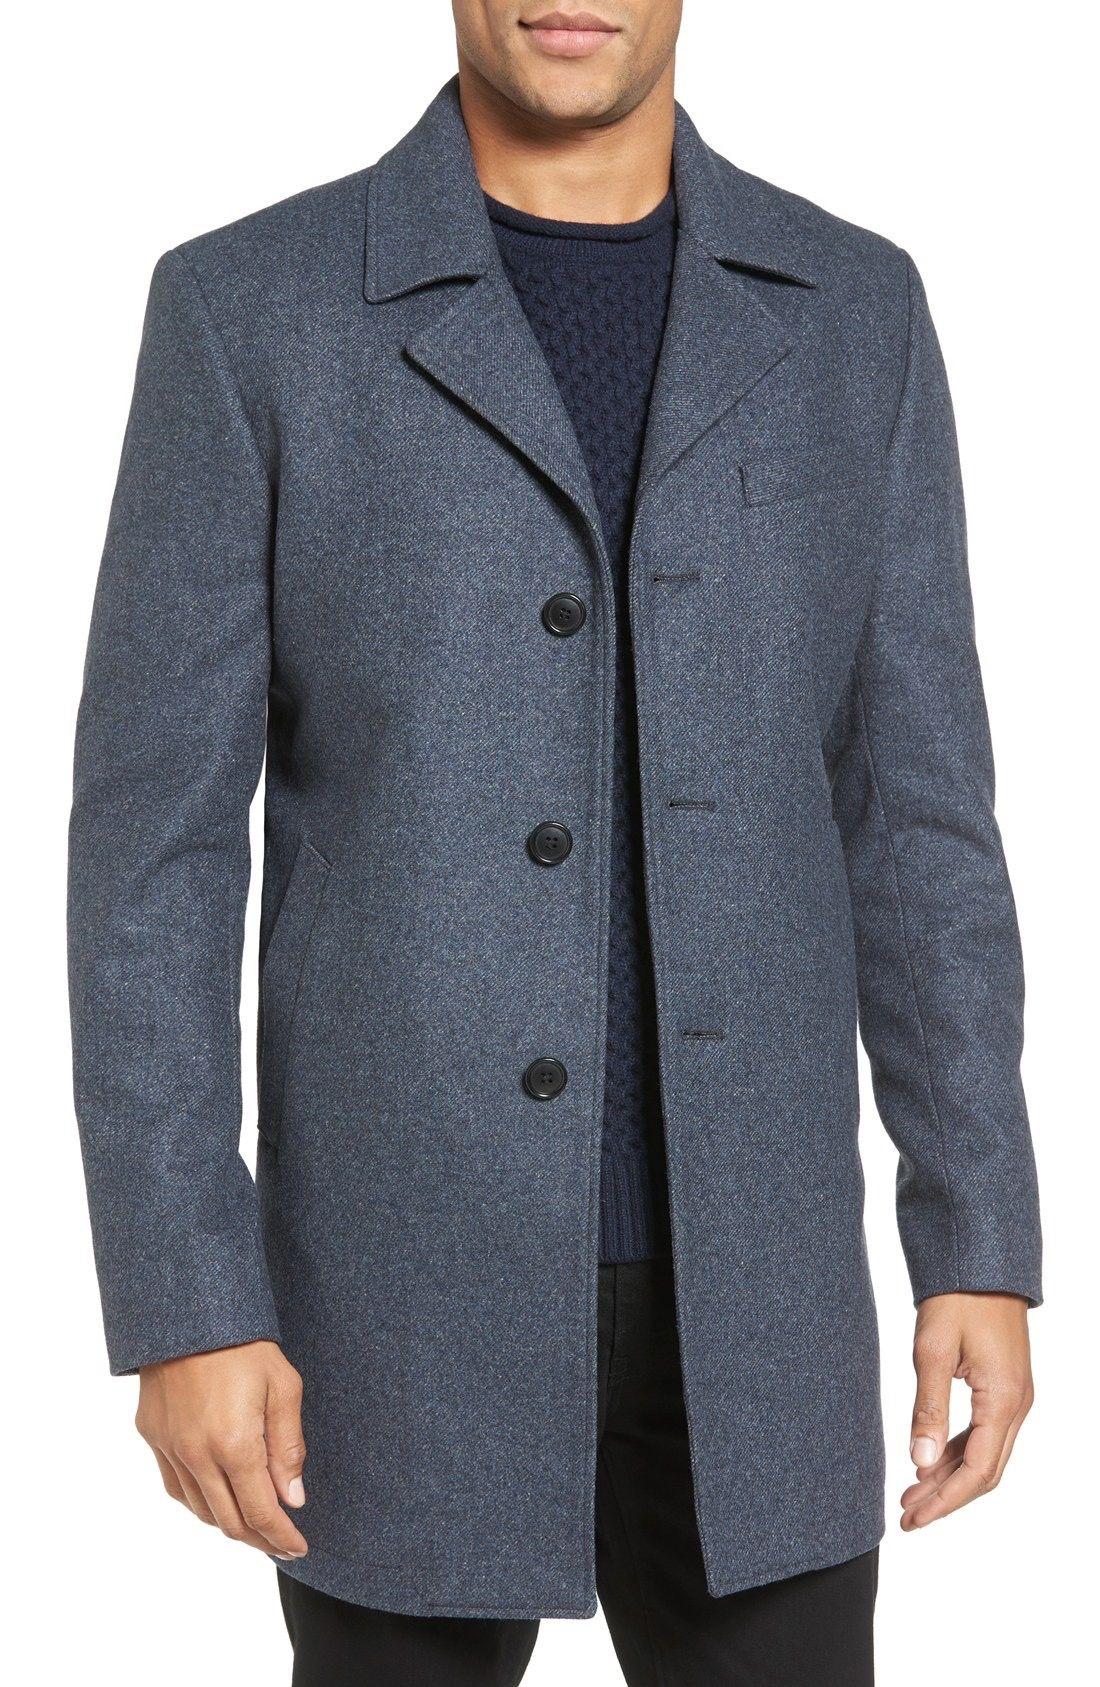 07168303cd9 Michael Kors Slim Fit Wool Blend Top Coat available at  Nordstrom ...